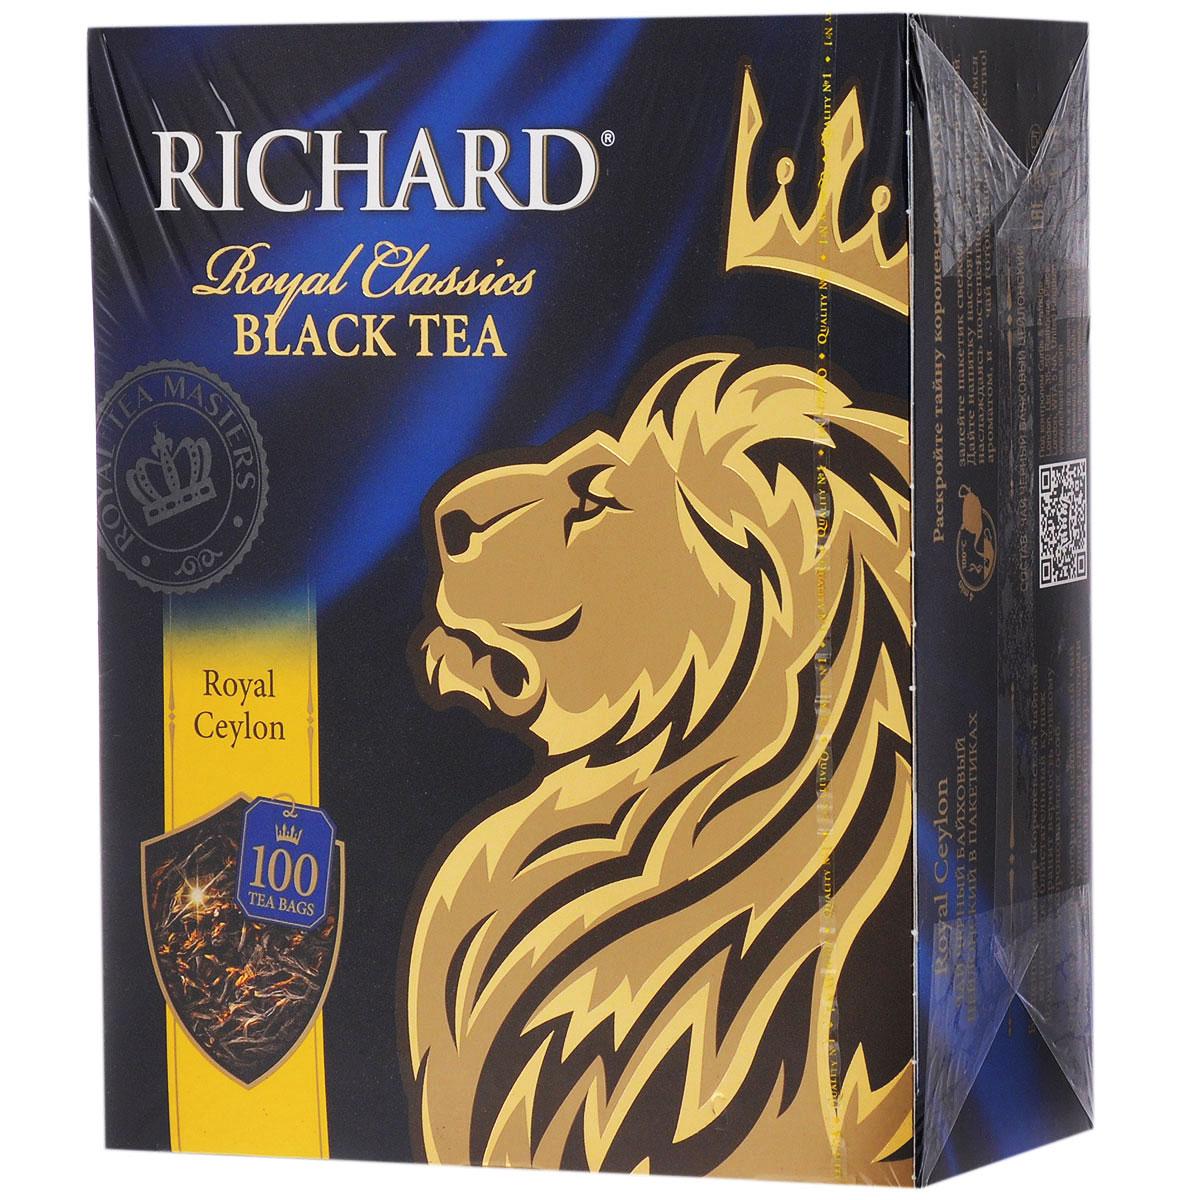 Richard Royal Ceylon черный чай в пакетиках, 100 шт lipton черный чай heart of ceylon 100 шт